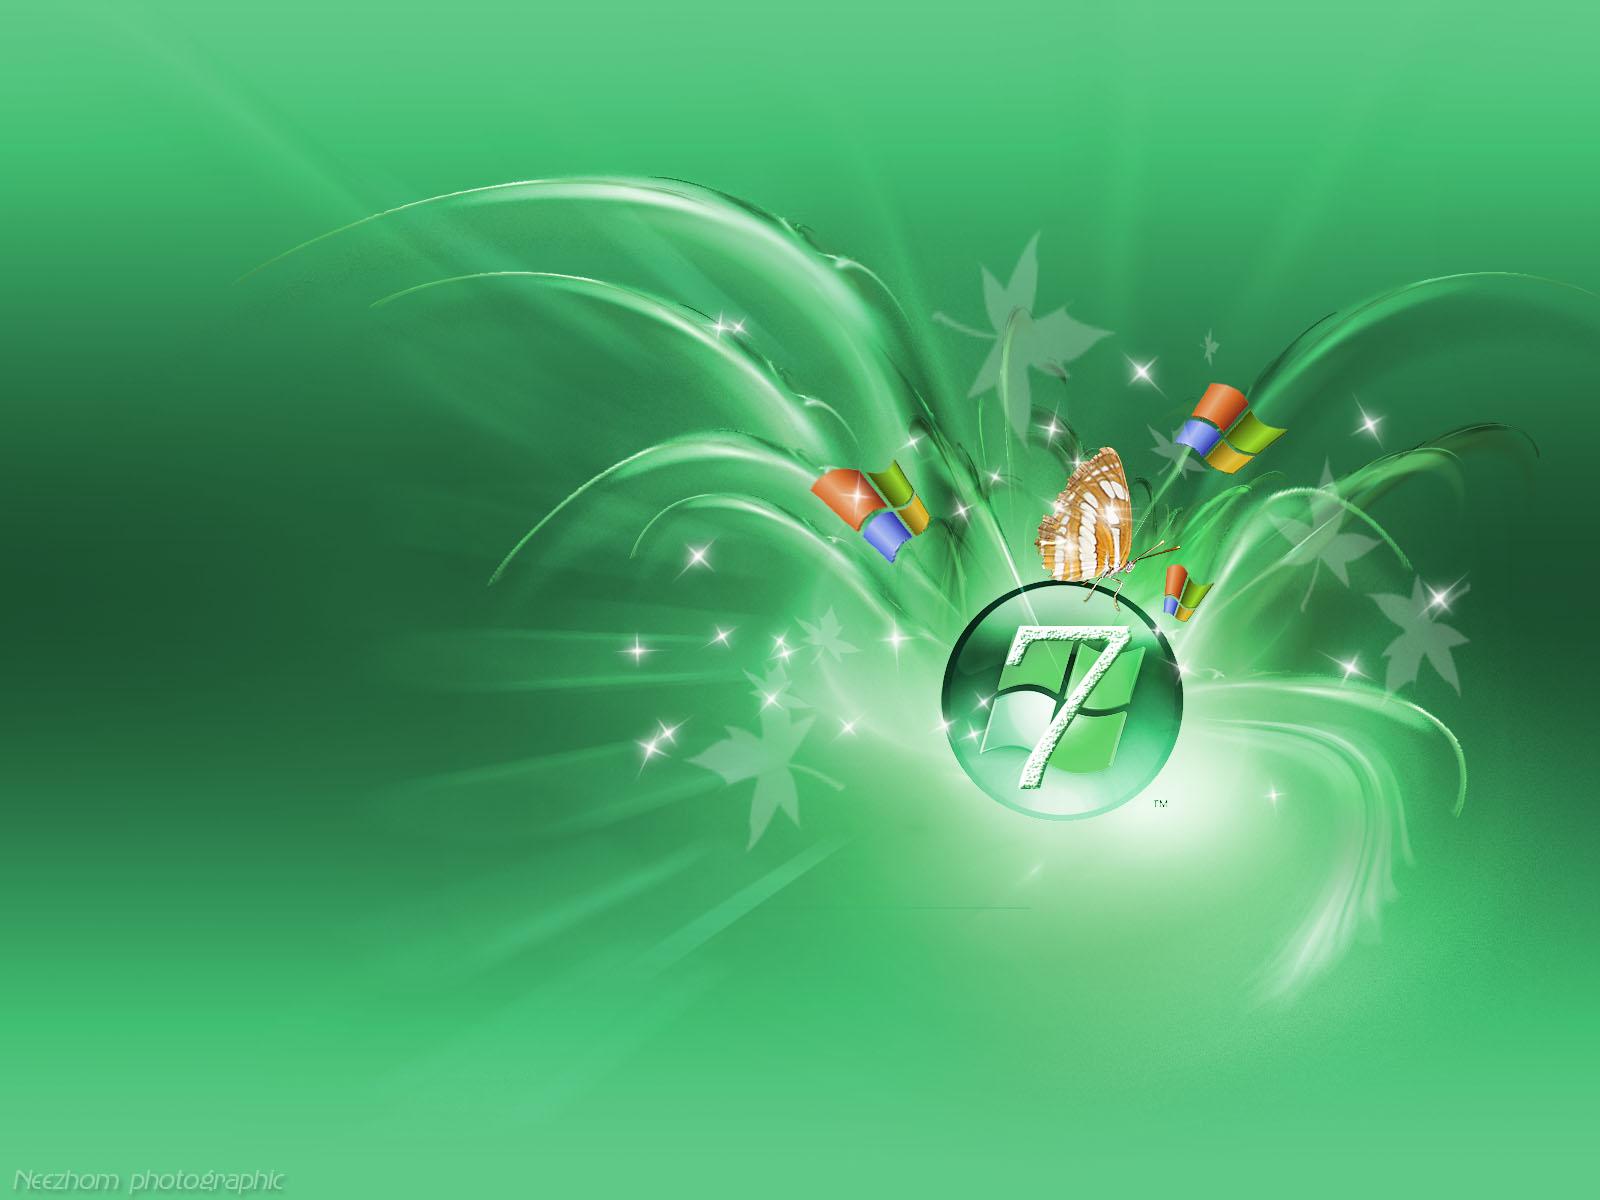 http://2.bp.blogspot.com/-05I2D8ZKoL4/UC-biyDr_MI/AAAAAAAAALY/4HuRLWmwEGk/s1600/Windows%2B7%2Bwallpaper%2B4%2B-%2BFabulous%2BSeven.jpg